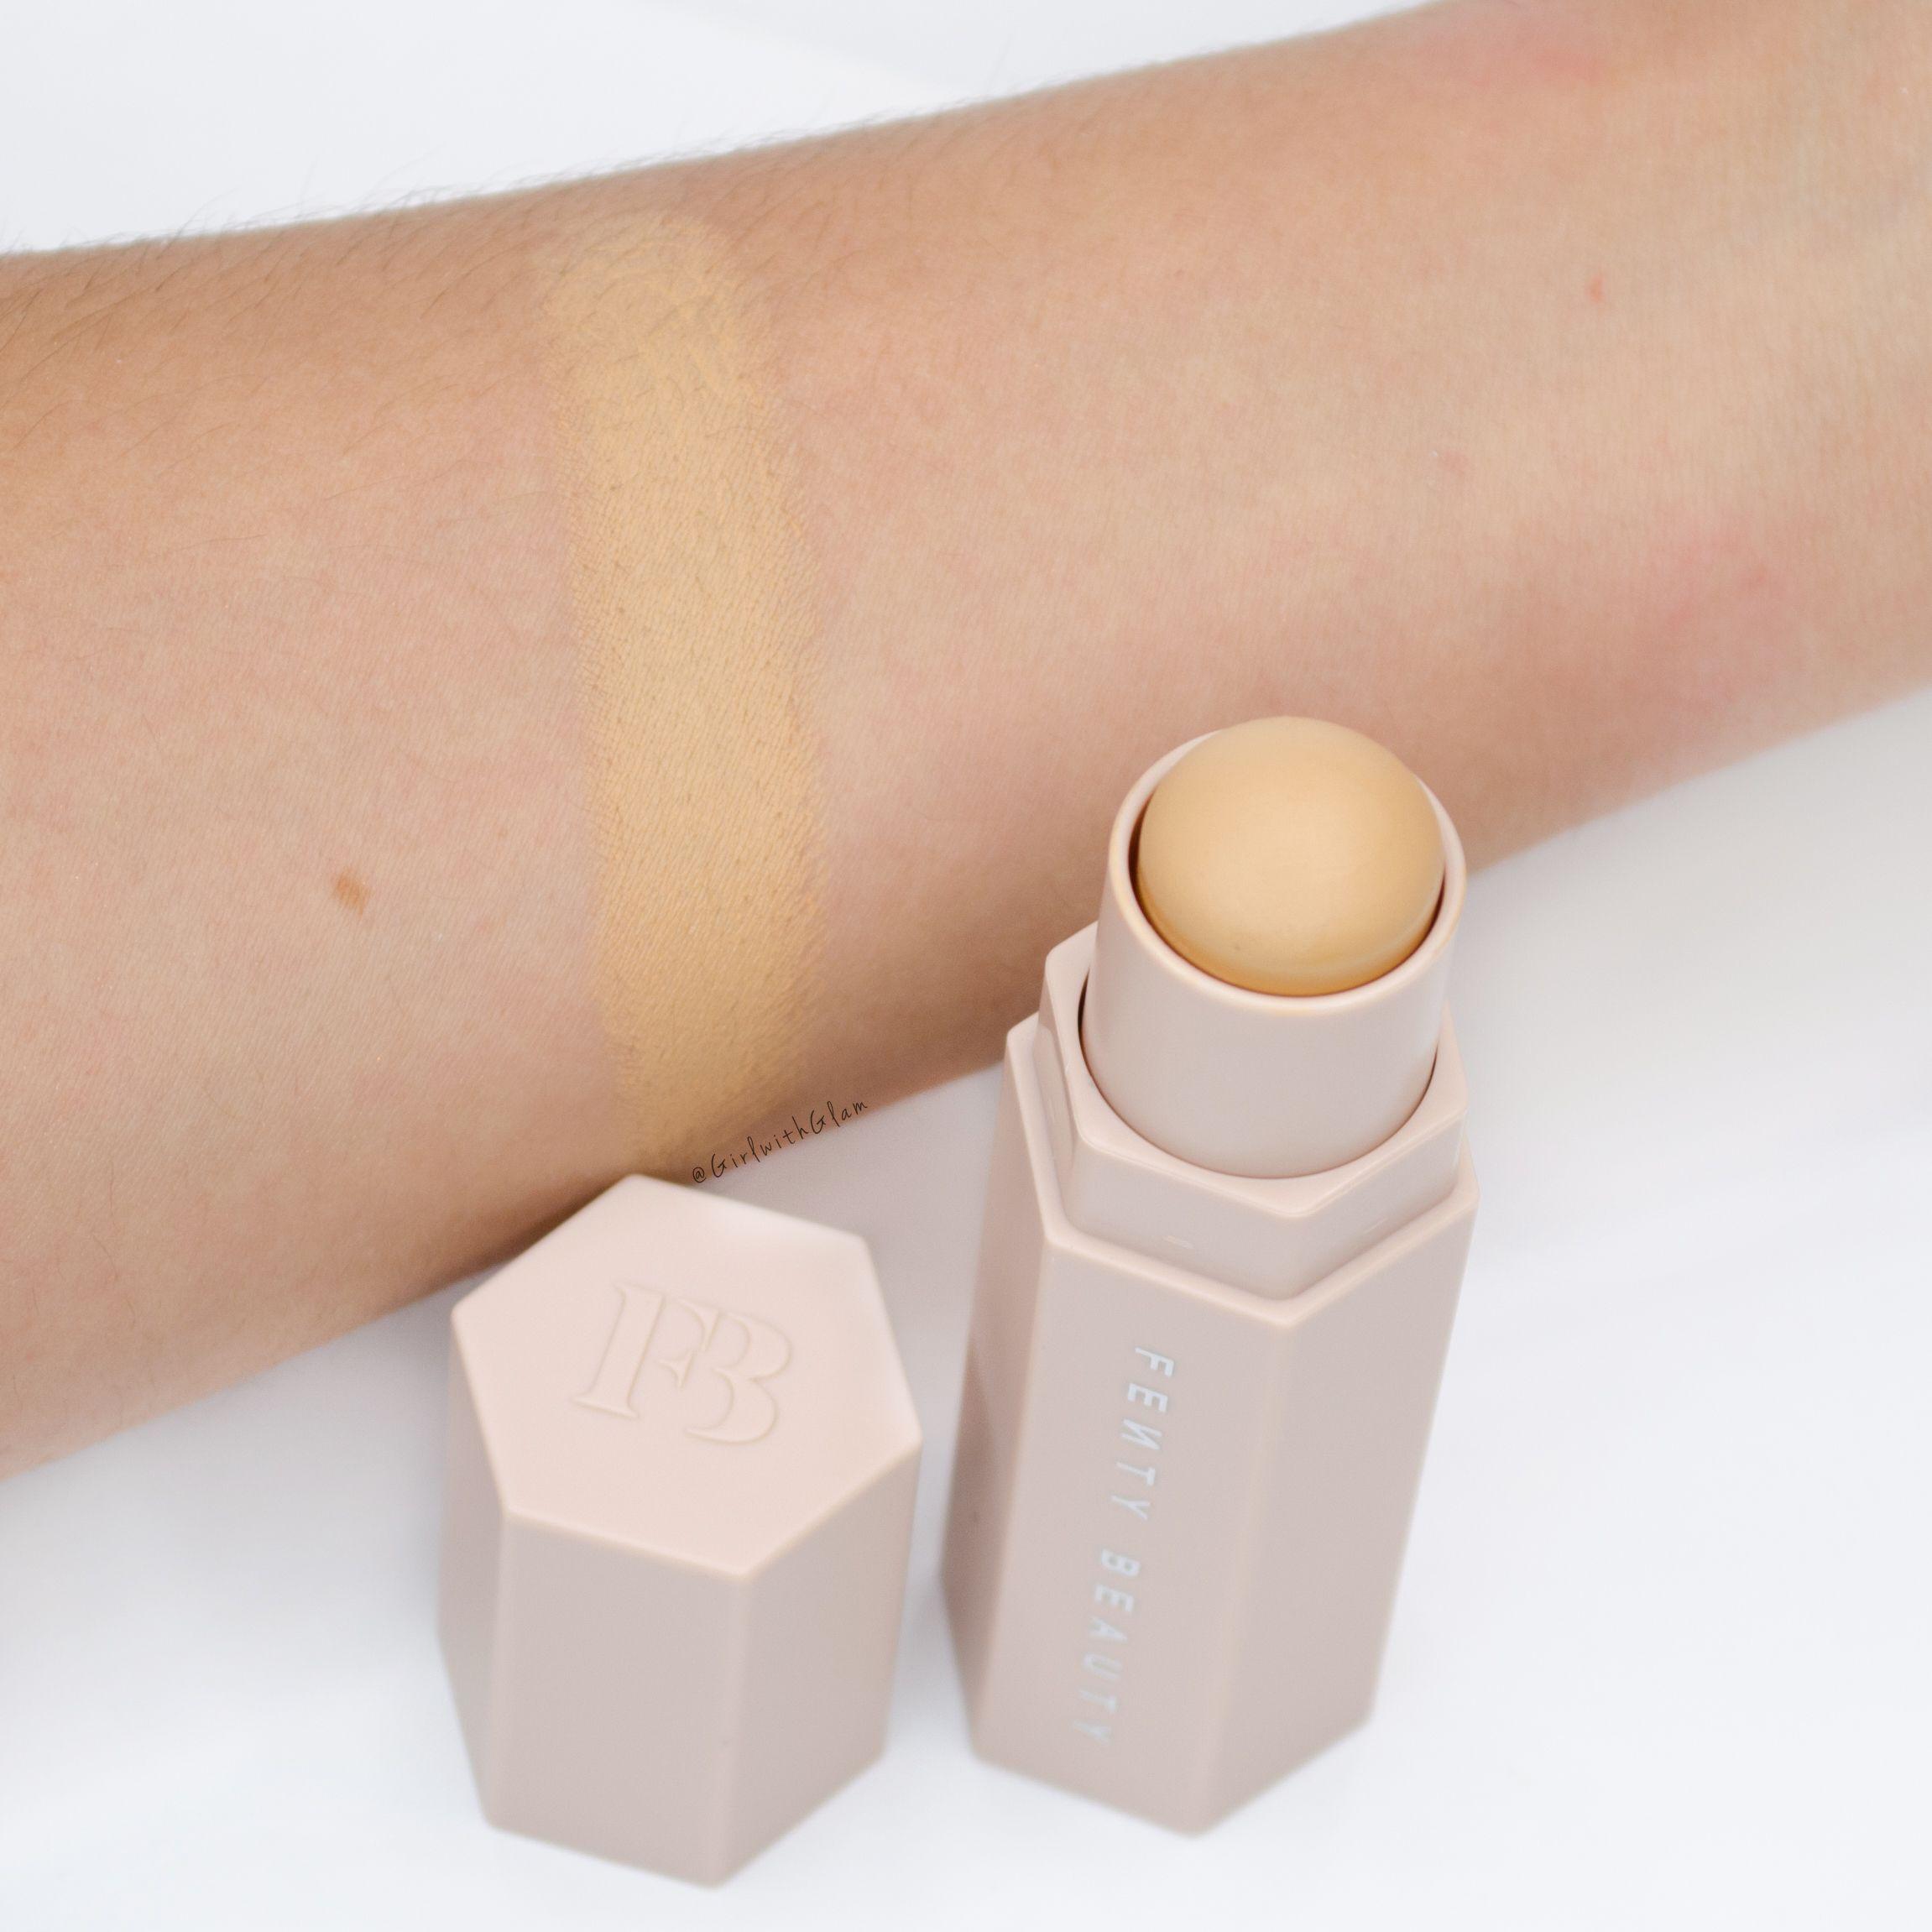 Fenty Beauty Product Review Match Stix Matte Skinstick